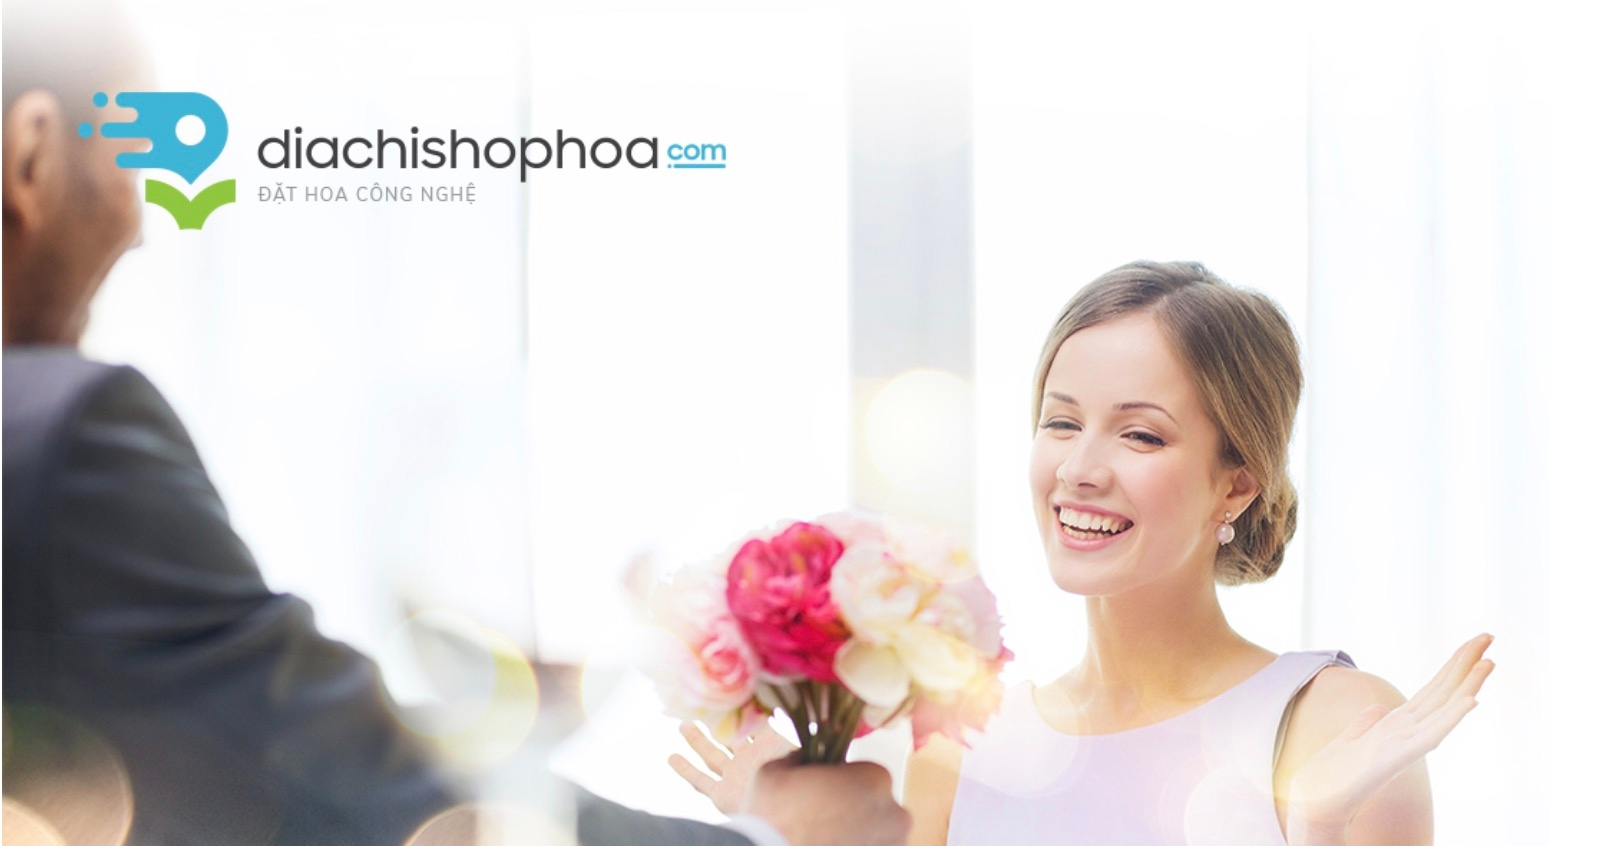 Địa Chỉ Shop Hoa (@diachishophoaf) Cover Image